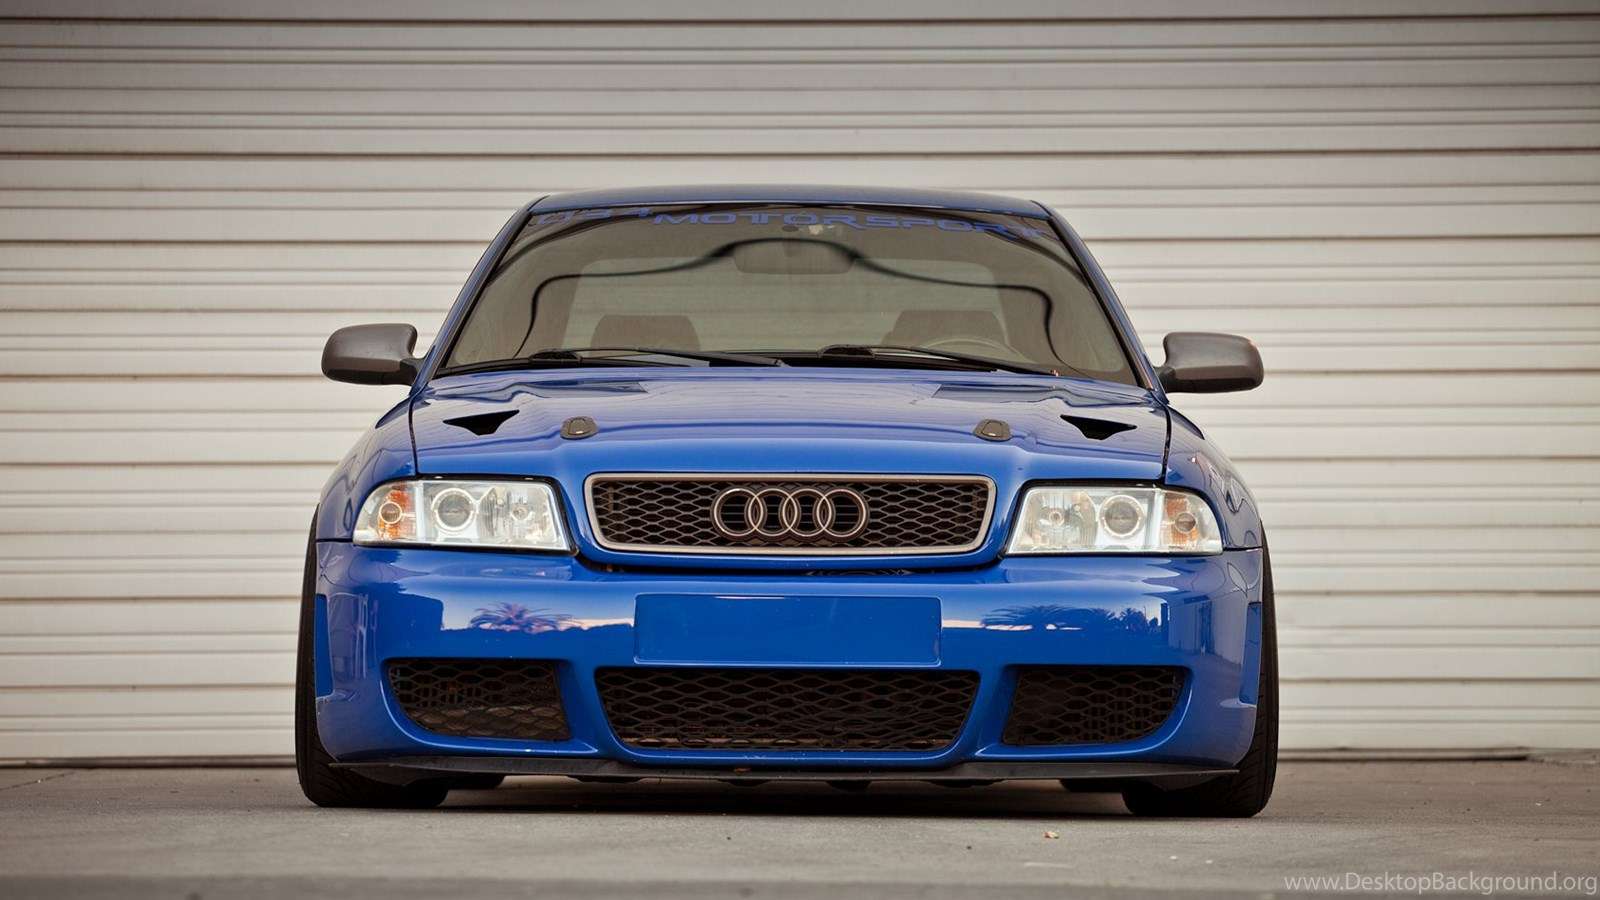 Audi S4 B5 Stance Image Desktop Background